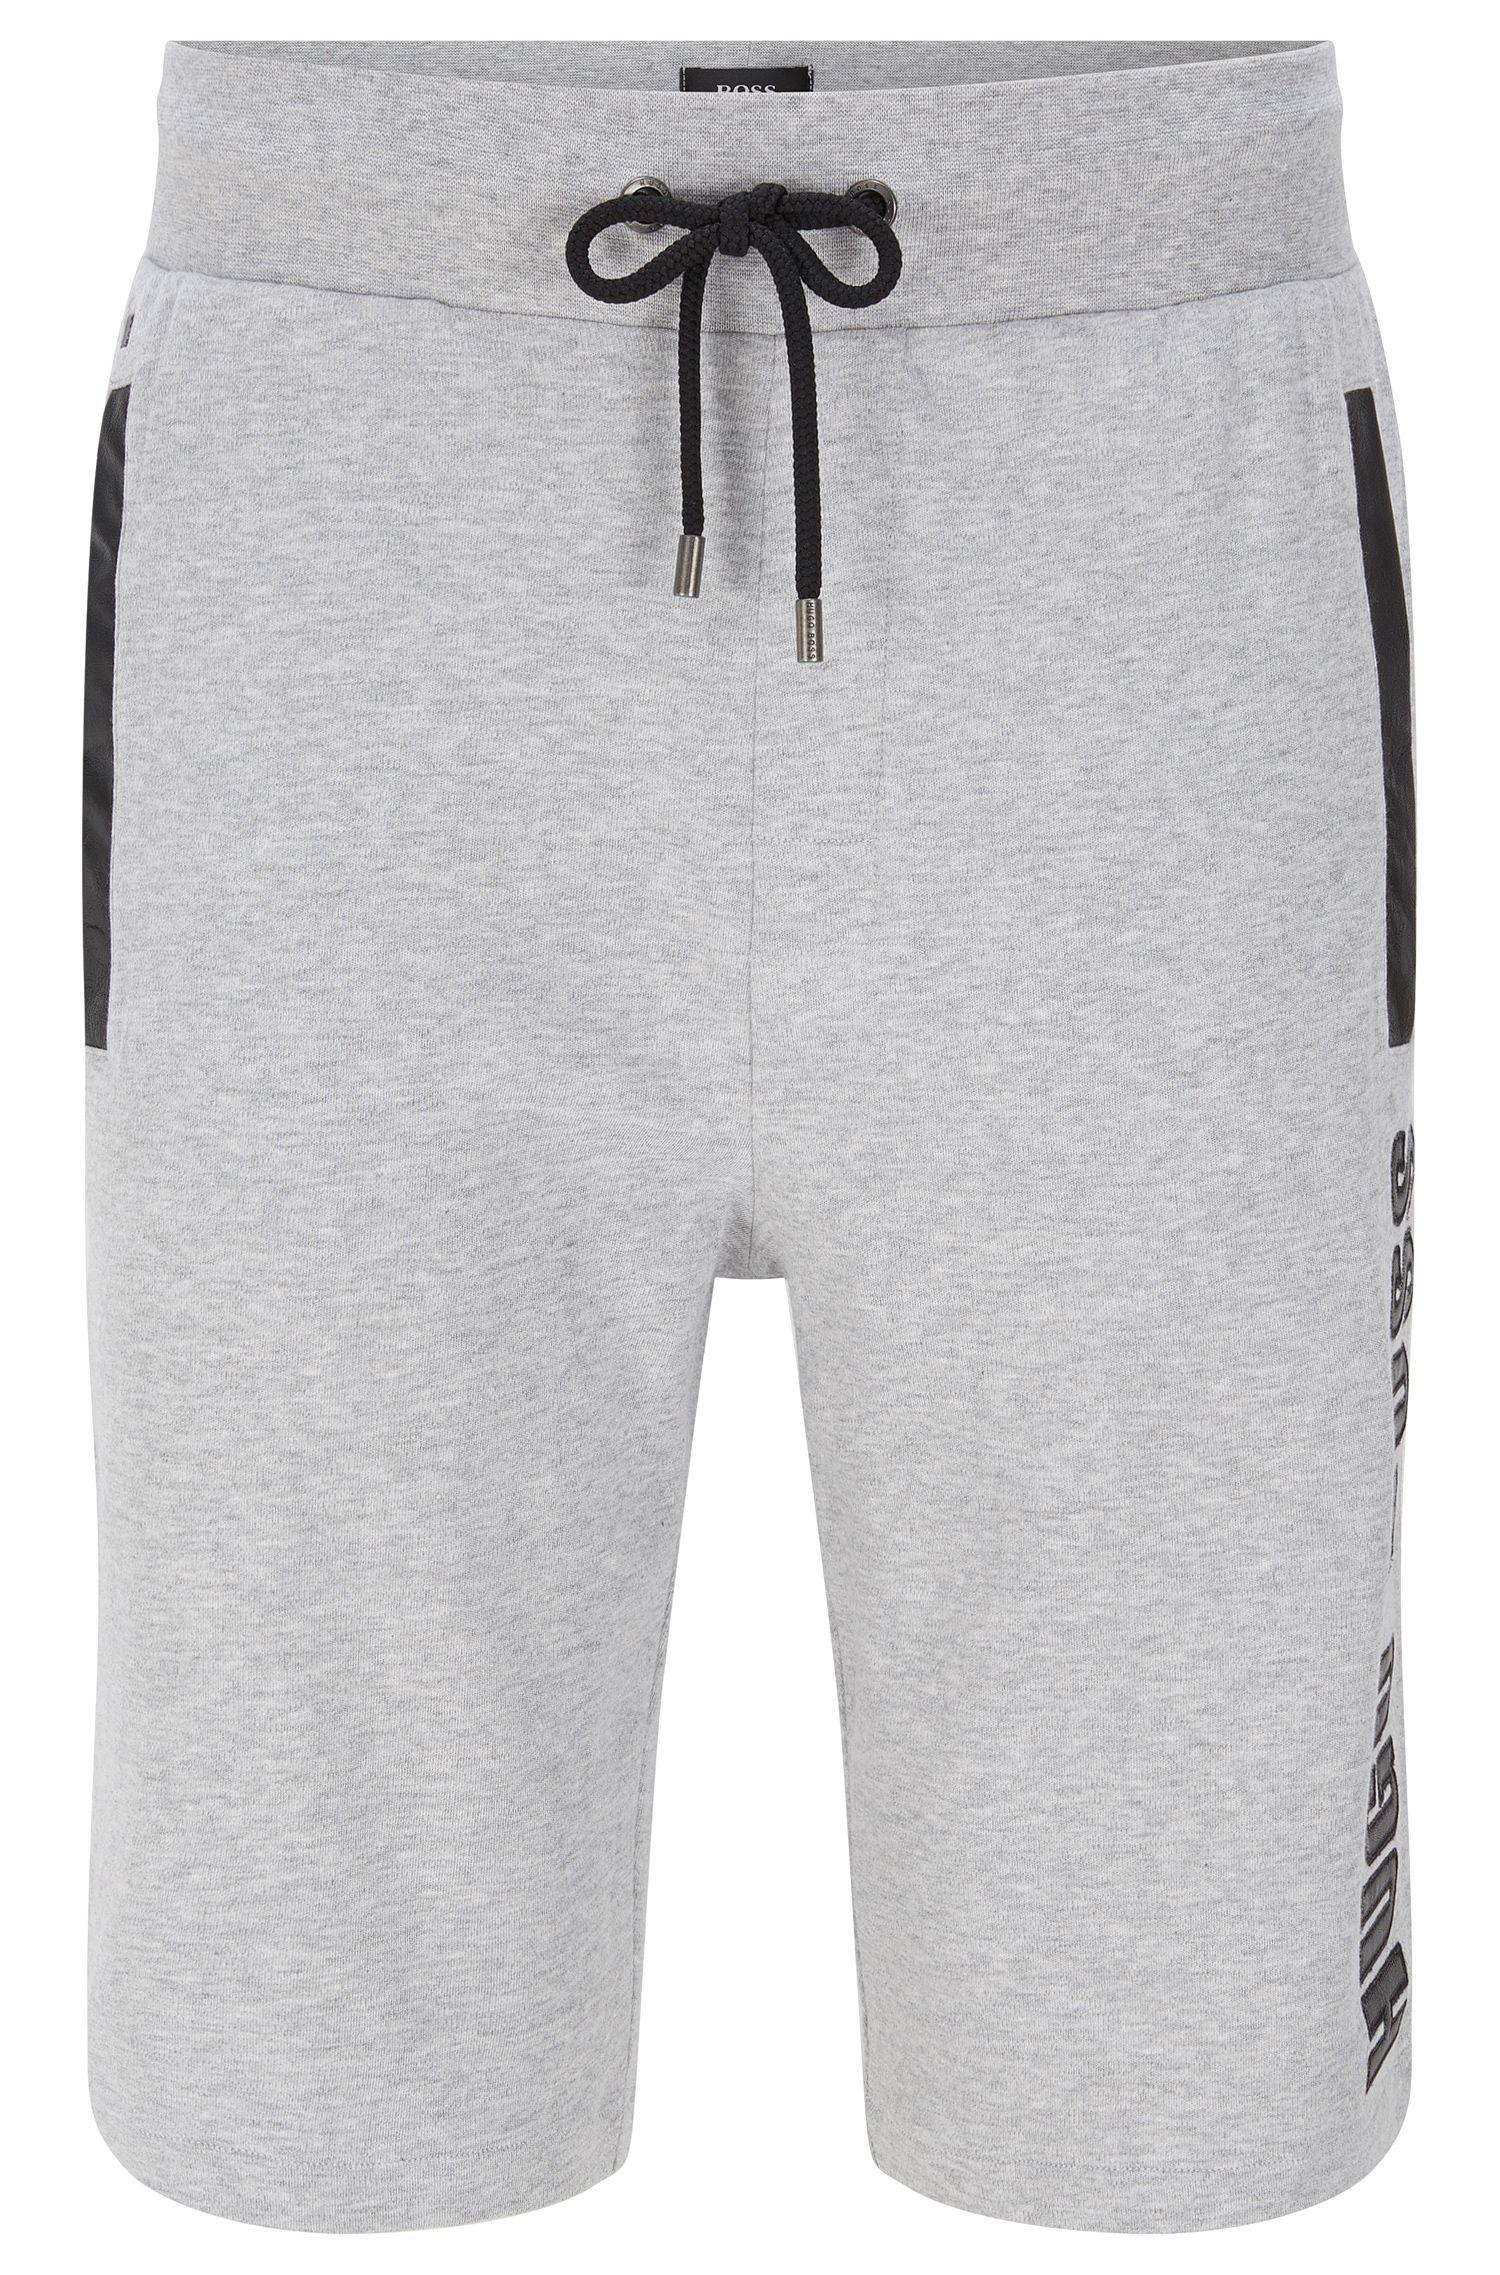 Shorts de chándal en algodón con detalles de piel sintética: 'Short Pant'